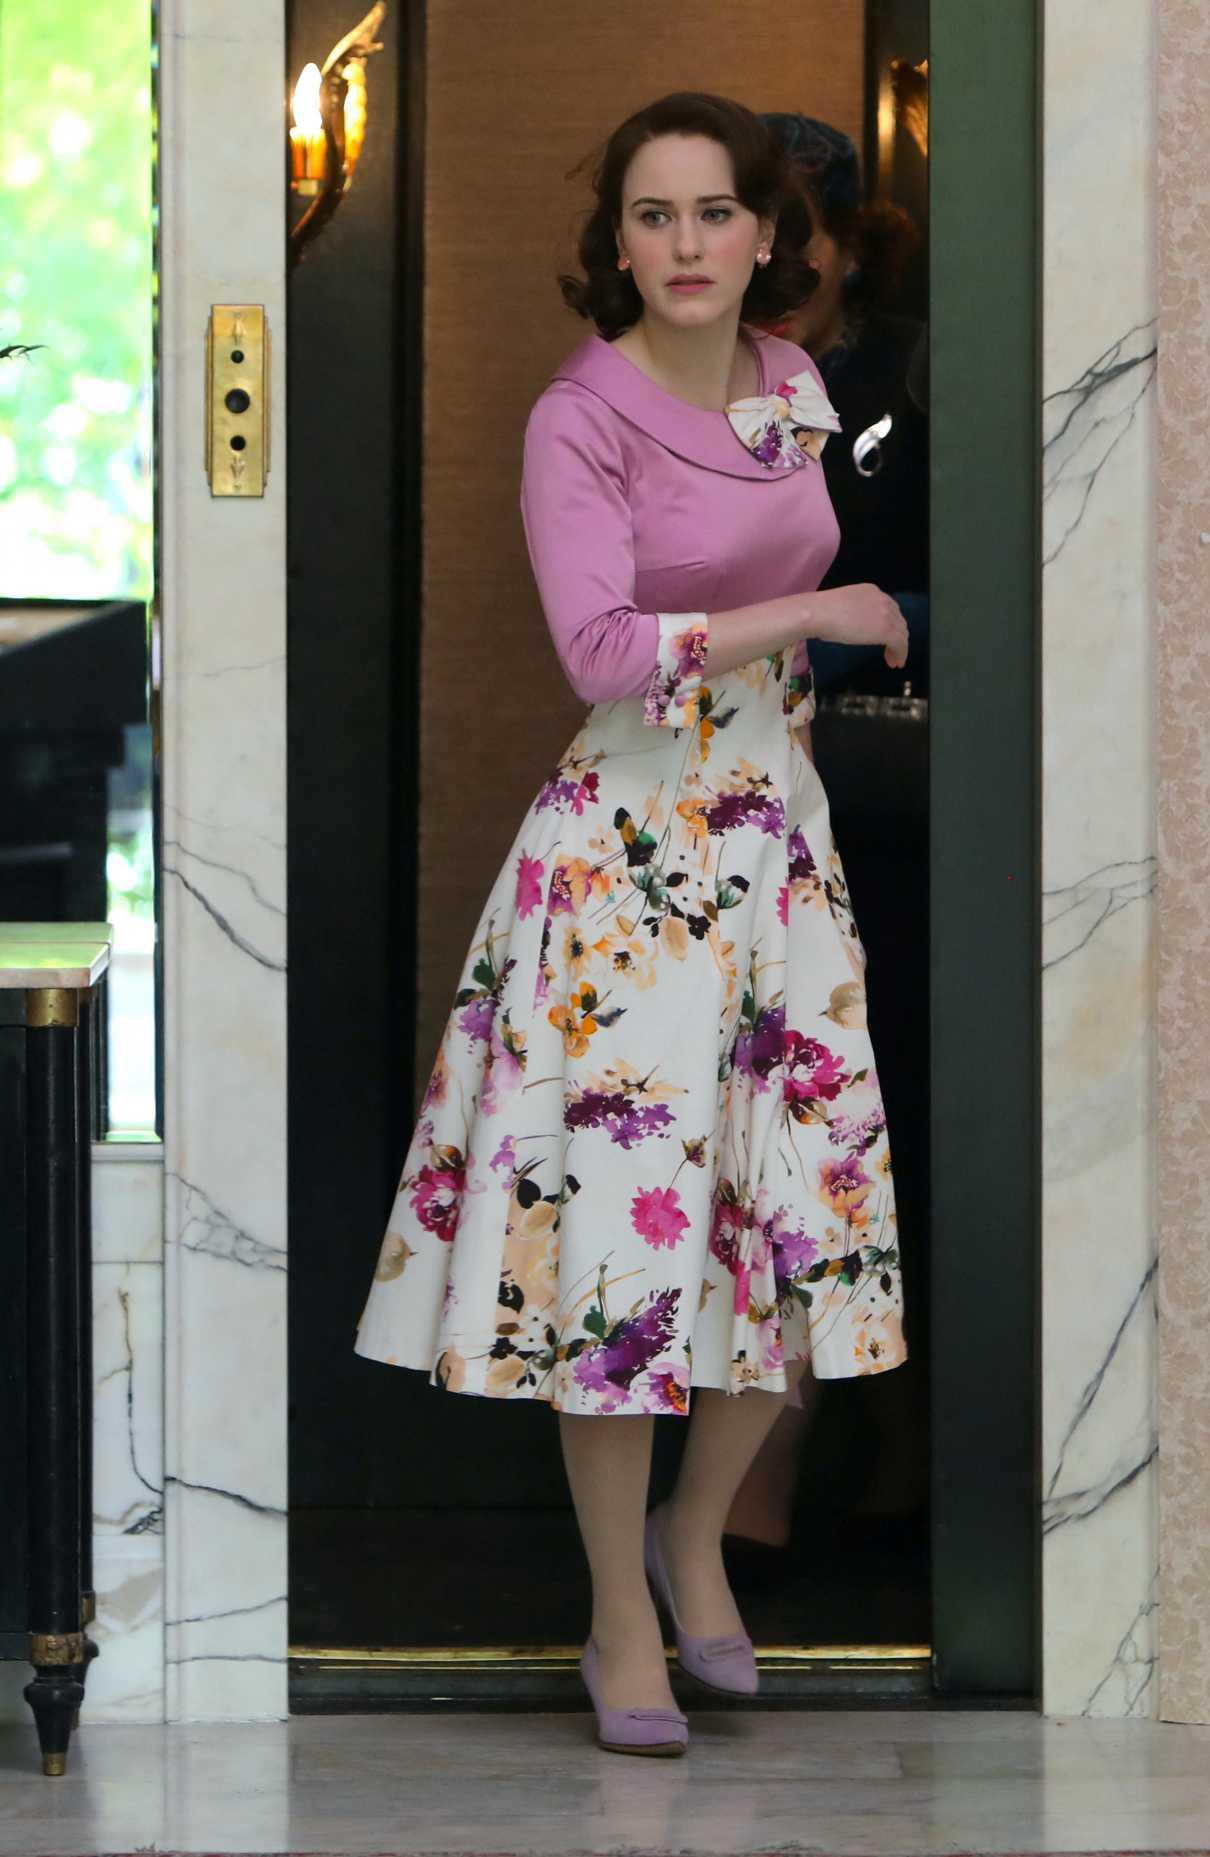 Rachel Brosnahan in a Floral Dress